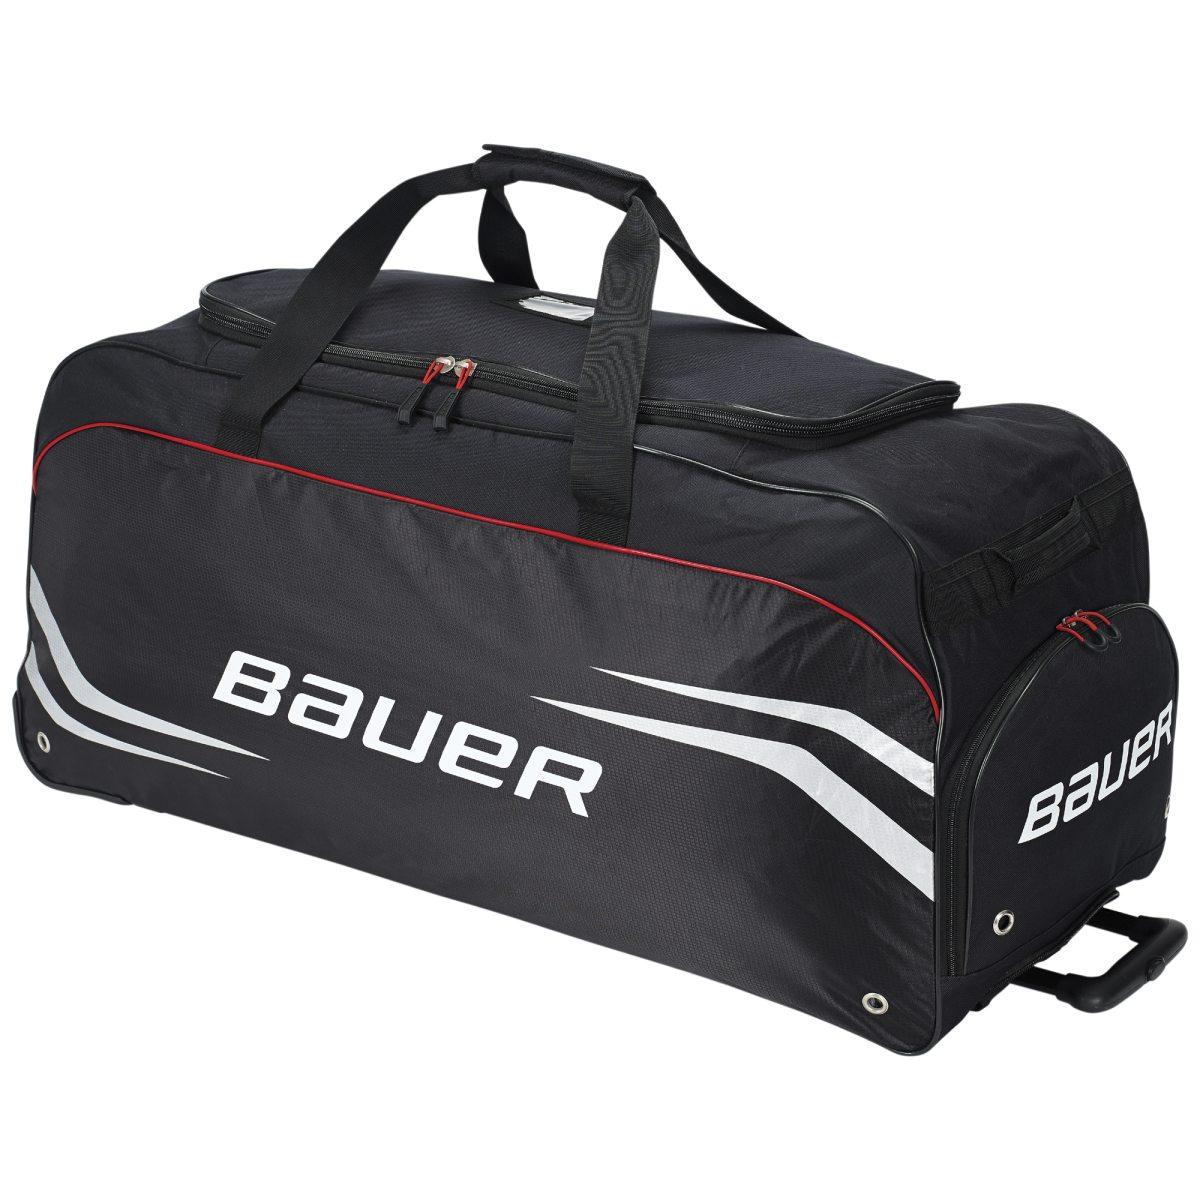 Ishockey bag